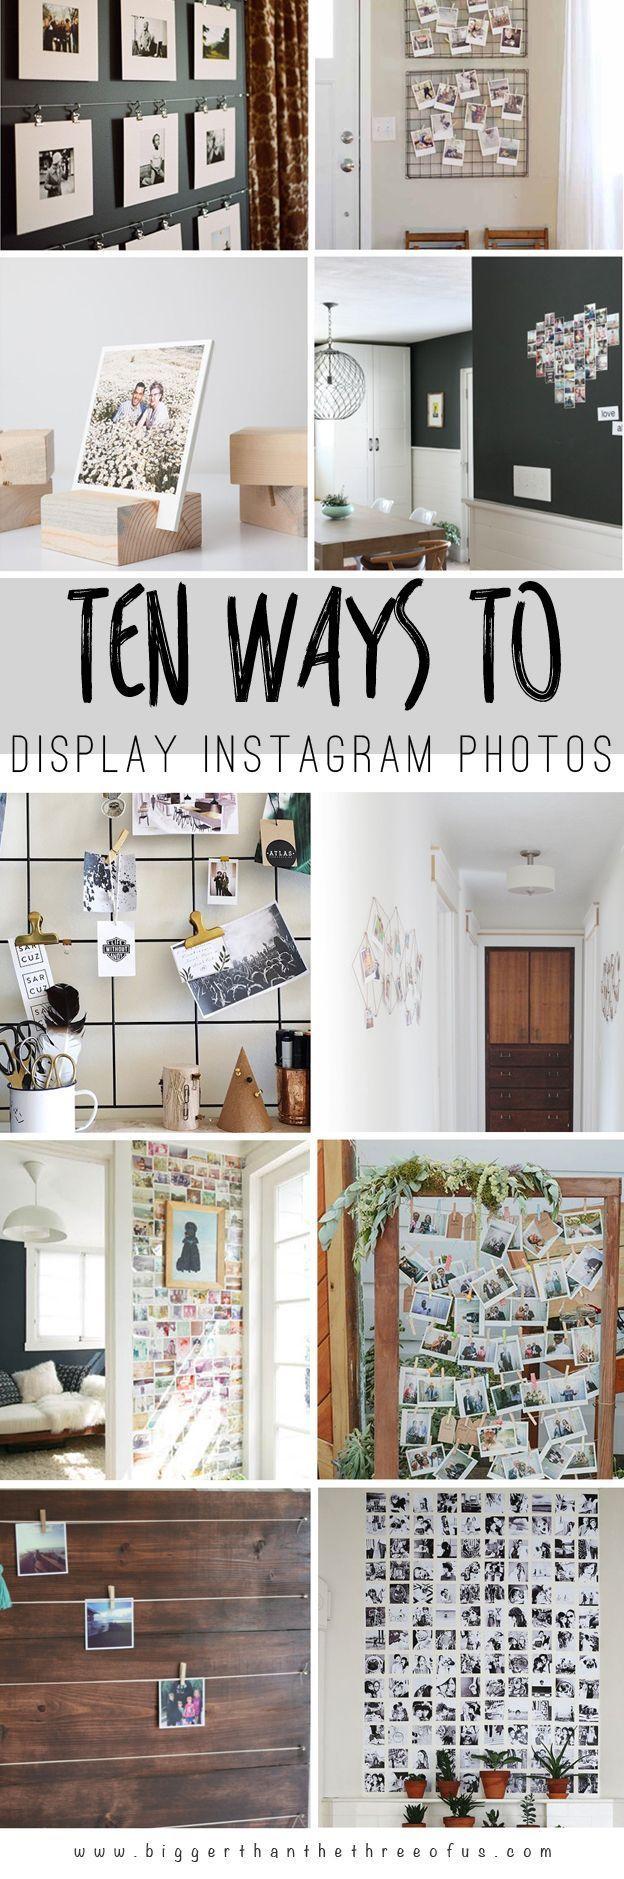 Home Design Ideas Instagram: 10 Ways To Display Instagram Pictures